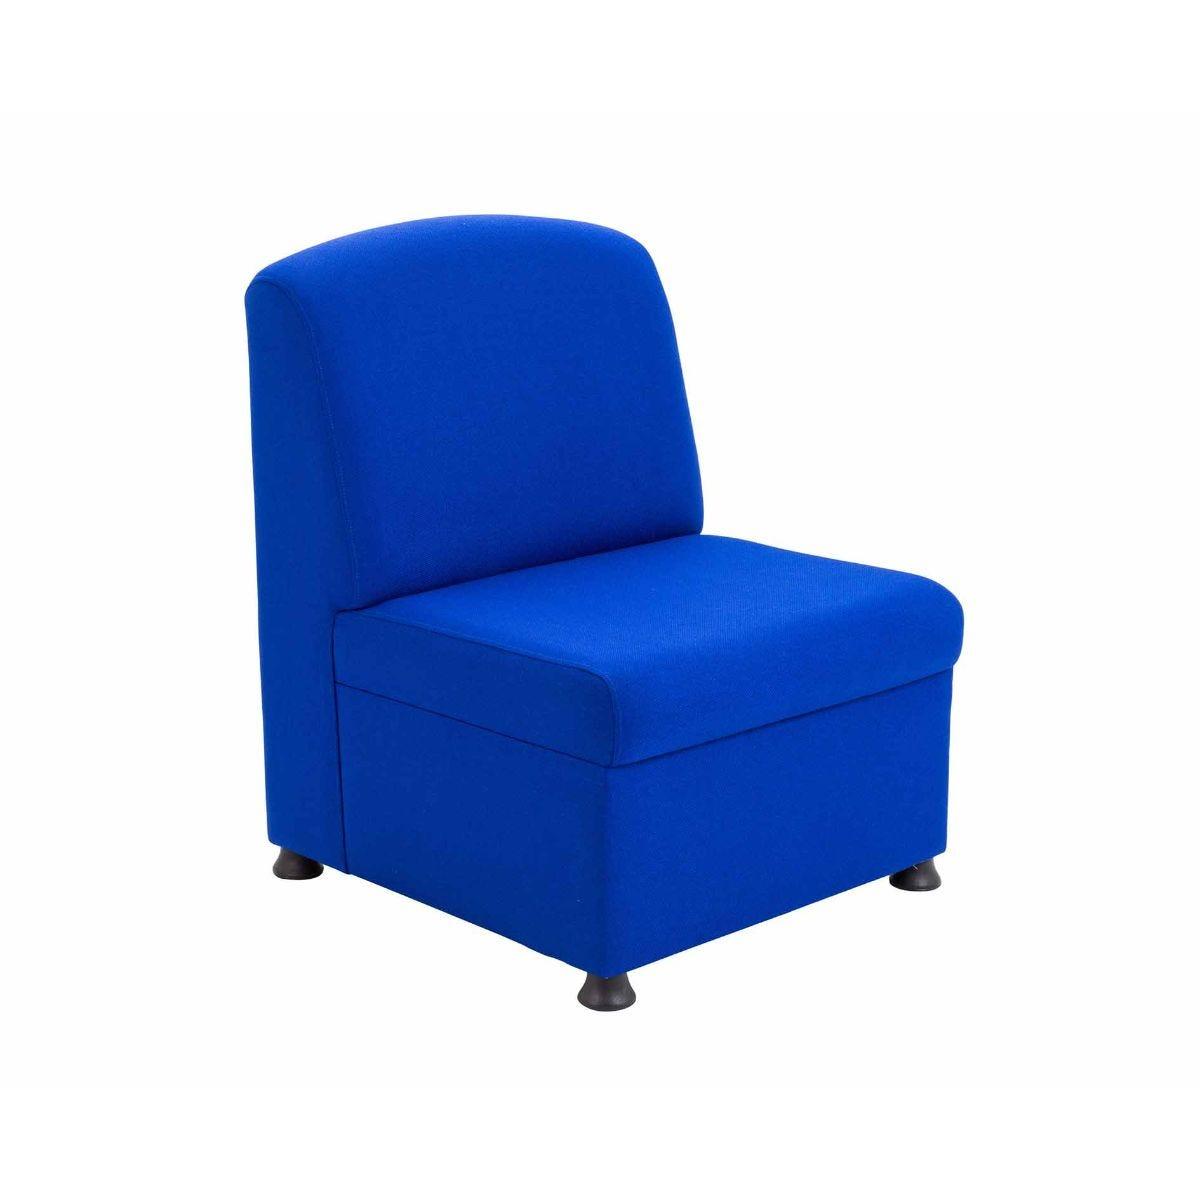 TC Office TC Office Glacier Modular Reception Chair, Royal Blue | Desks > Modular Office Furniture > Modular Office Furniture